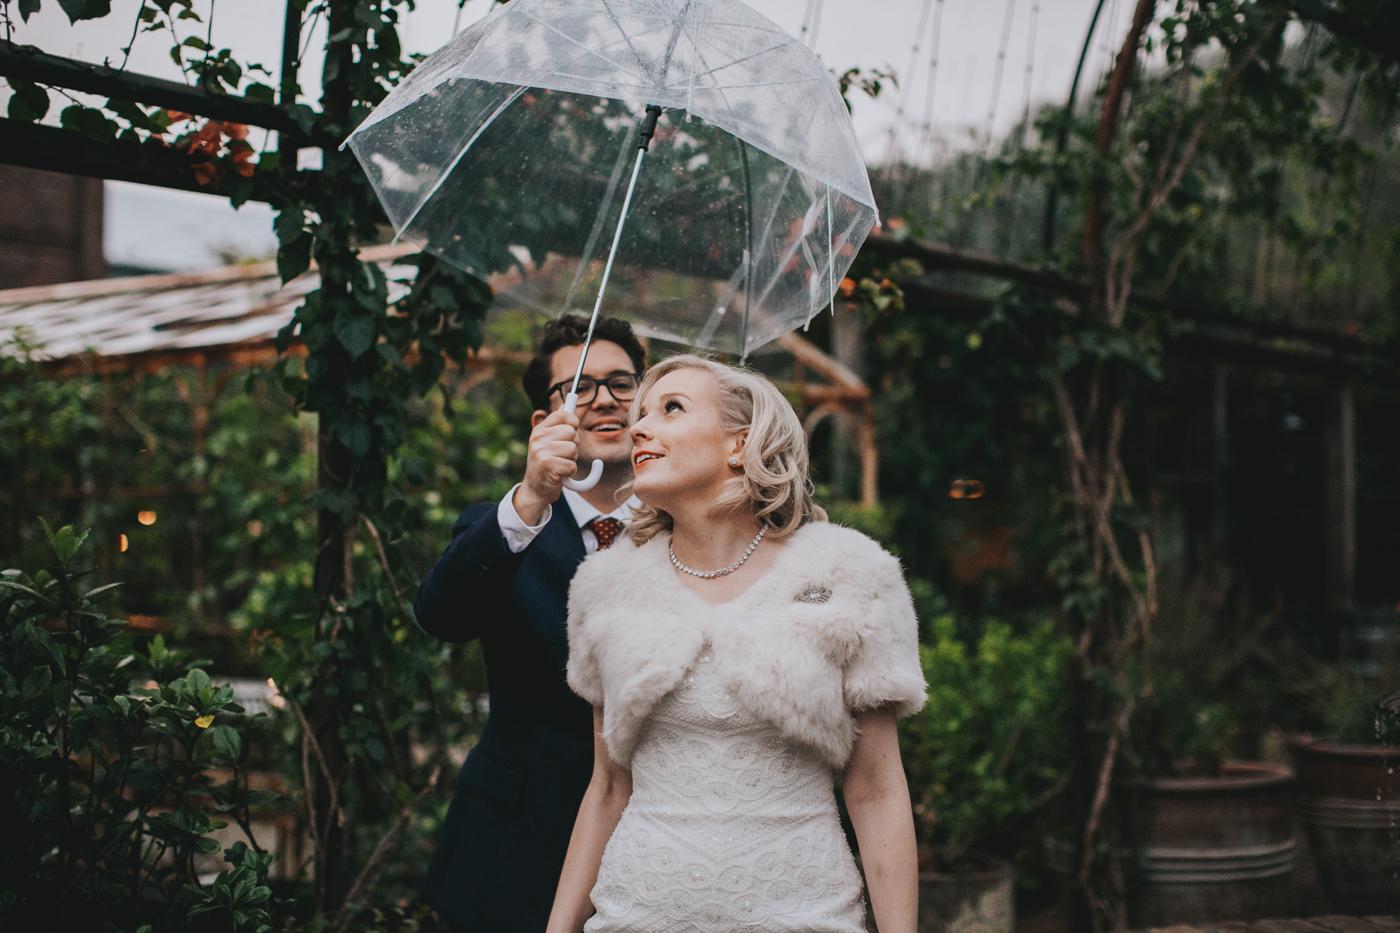 Jo & Tom Wedding - The Grounds of Alexandria - Samantha Heather Photography-249.jpg